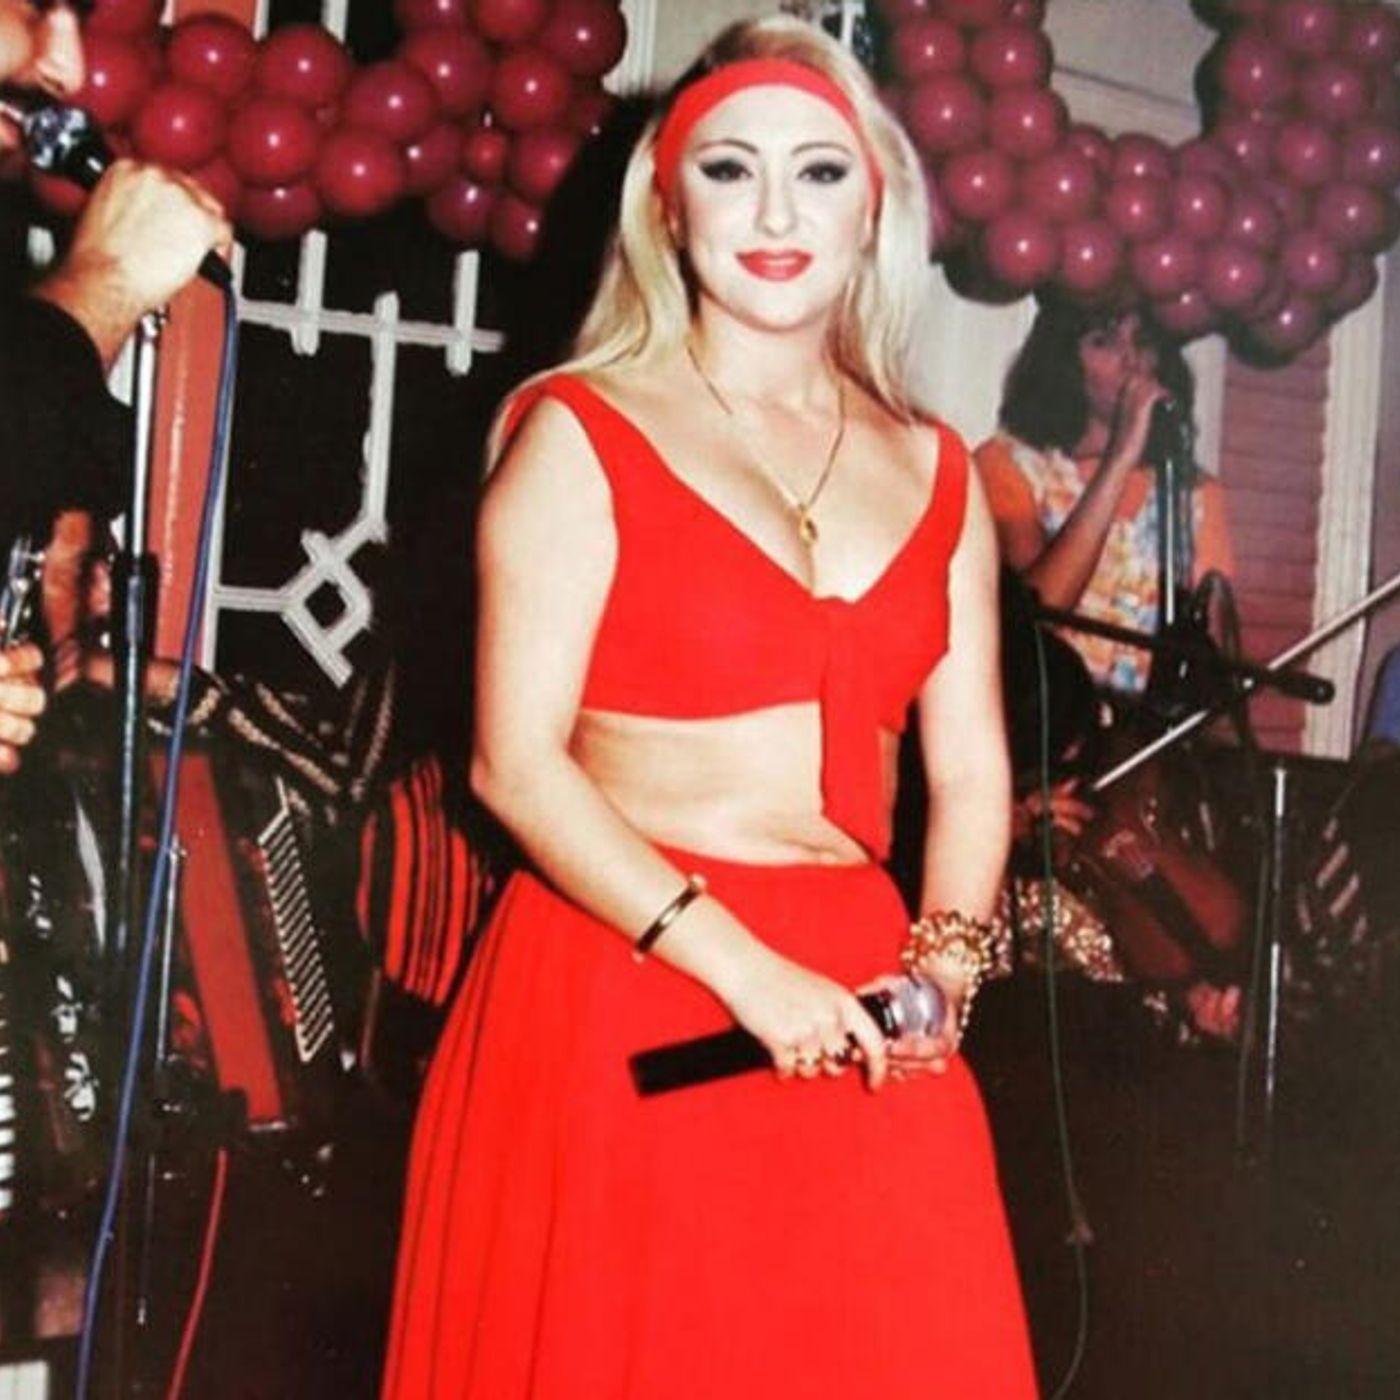 Güllü - Yalan Sevgiler (Kenan Karabulut Trap Remix)